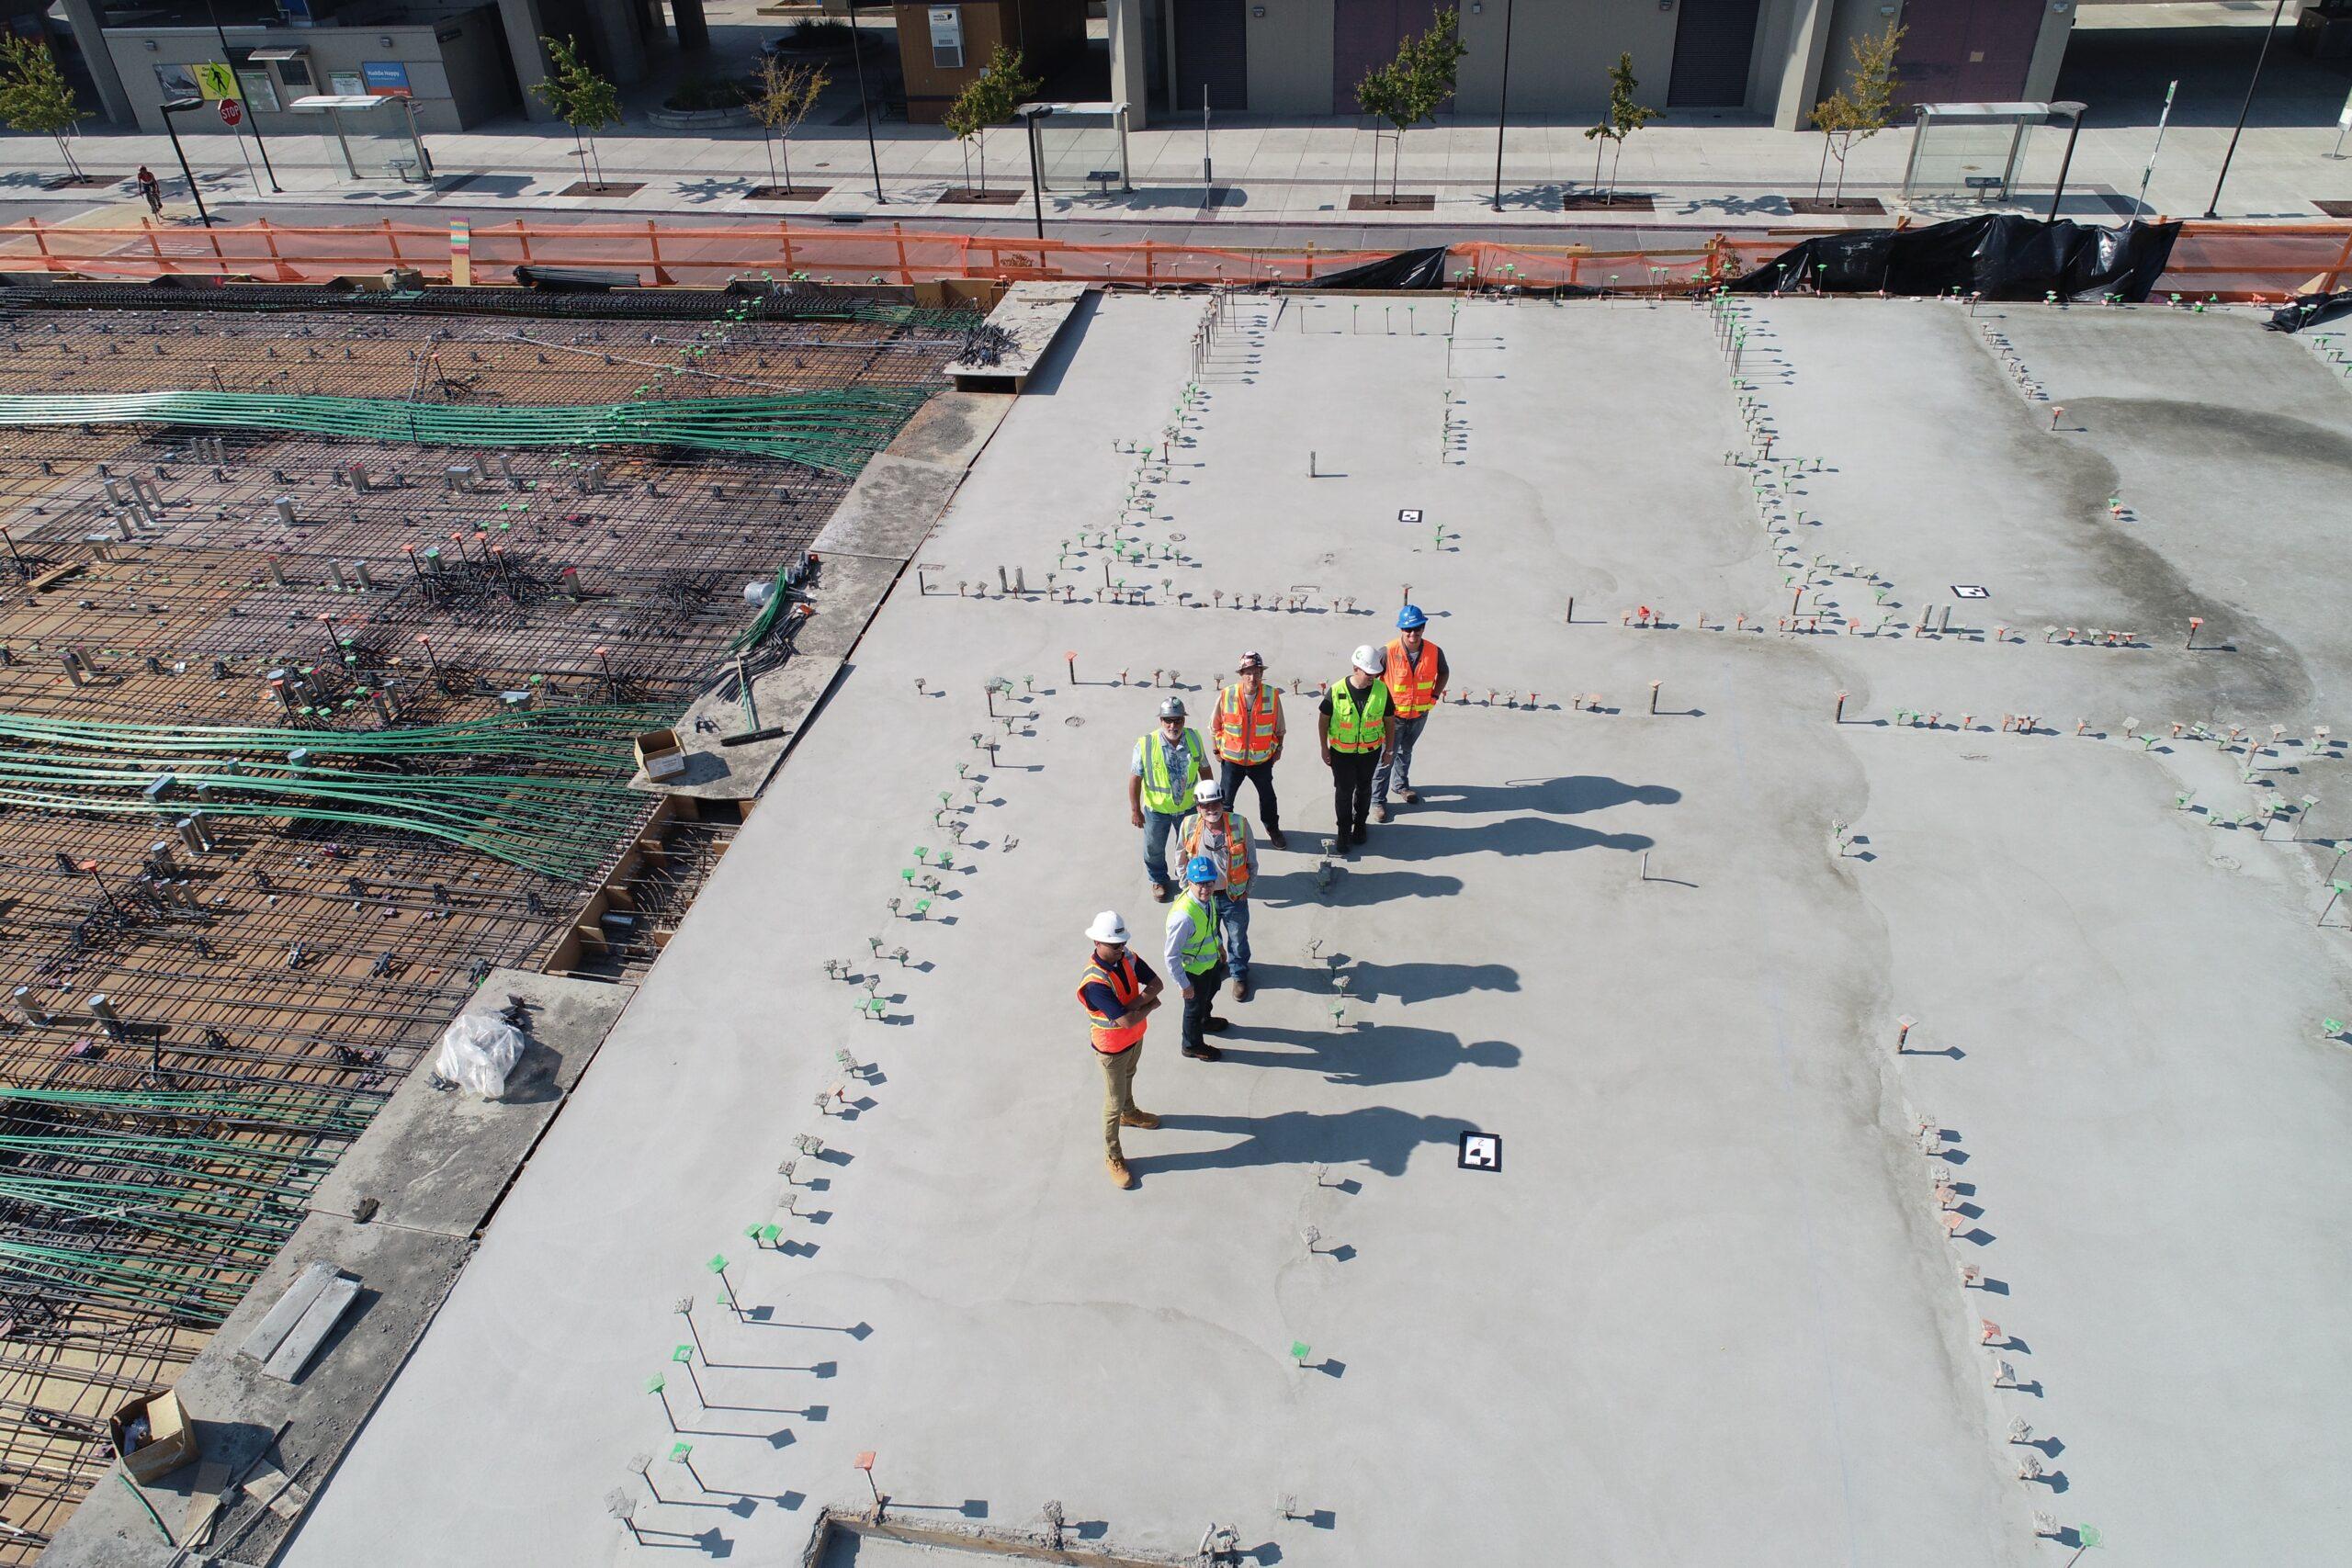 pracownicy budowlani podczas pracy